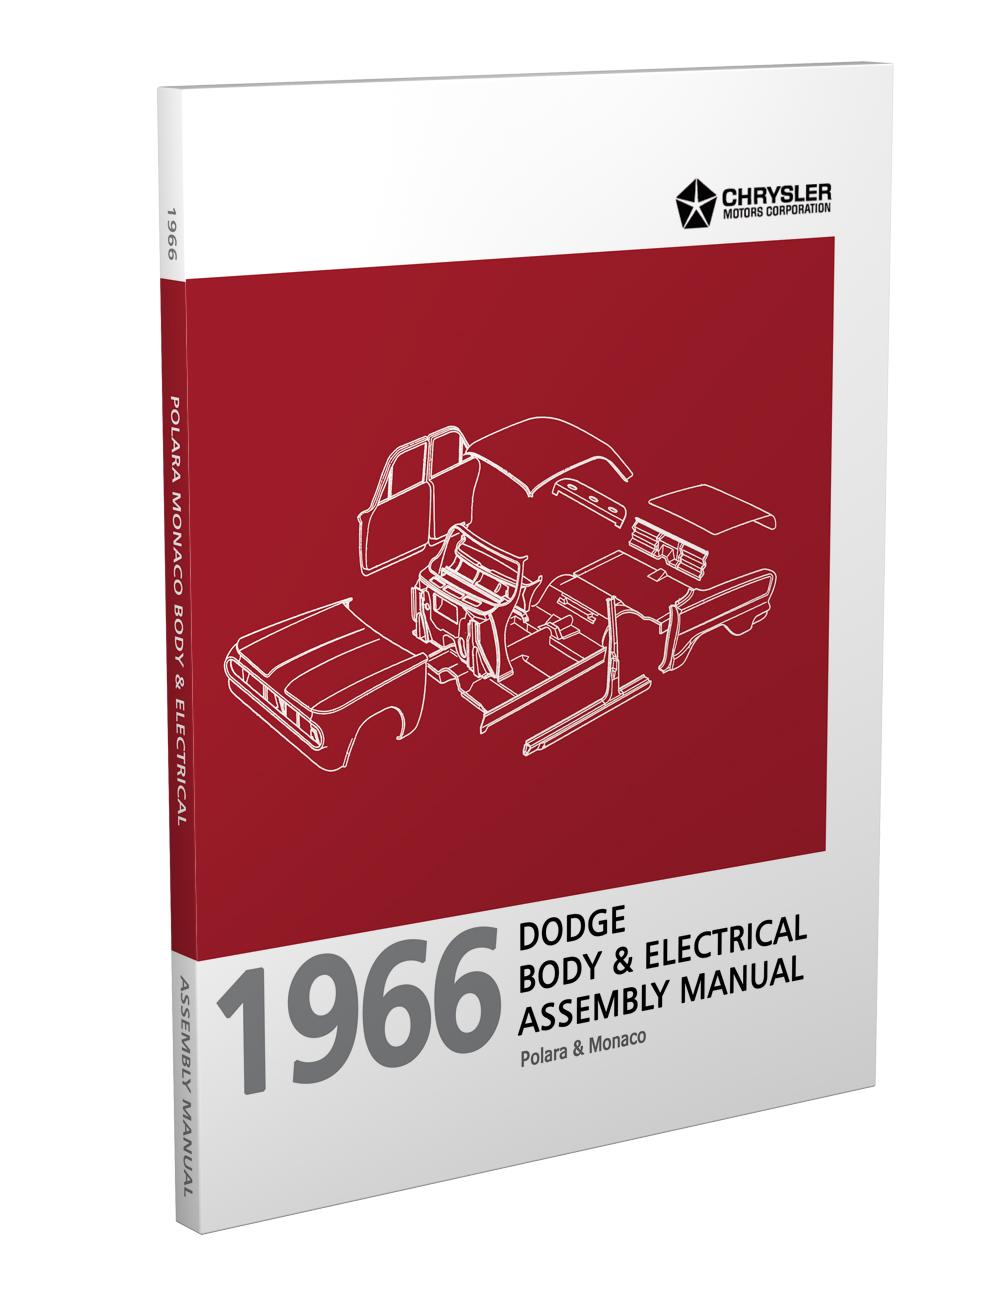 medium resolution of 1966 dodge polara and monaco body electrical assembly manual reprint